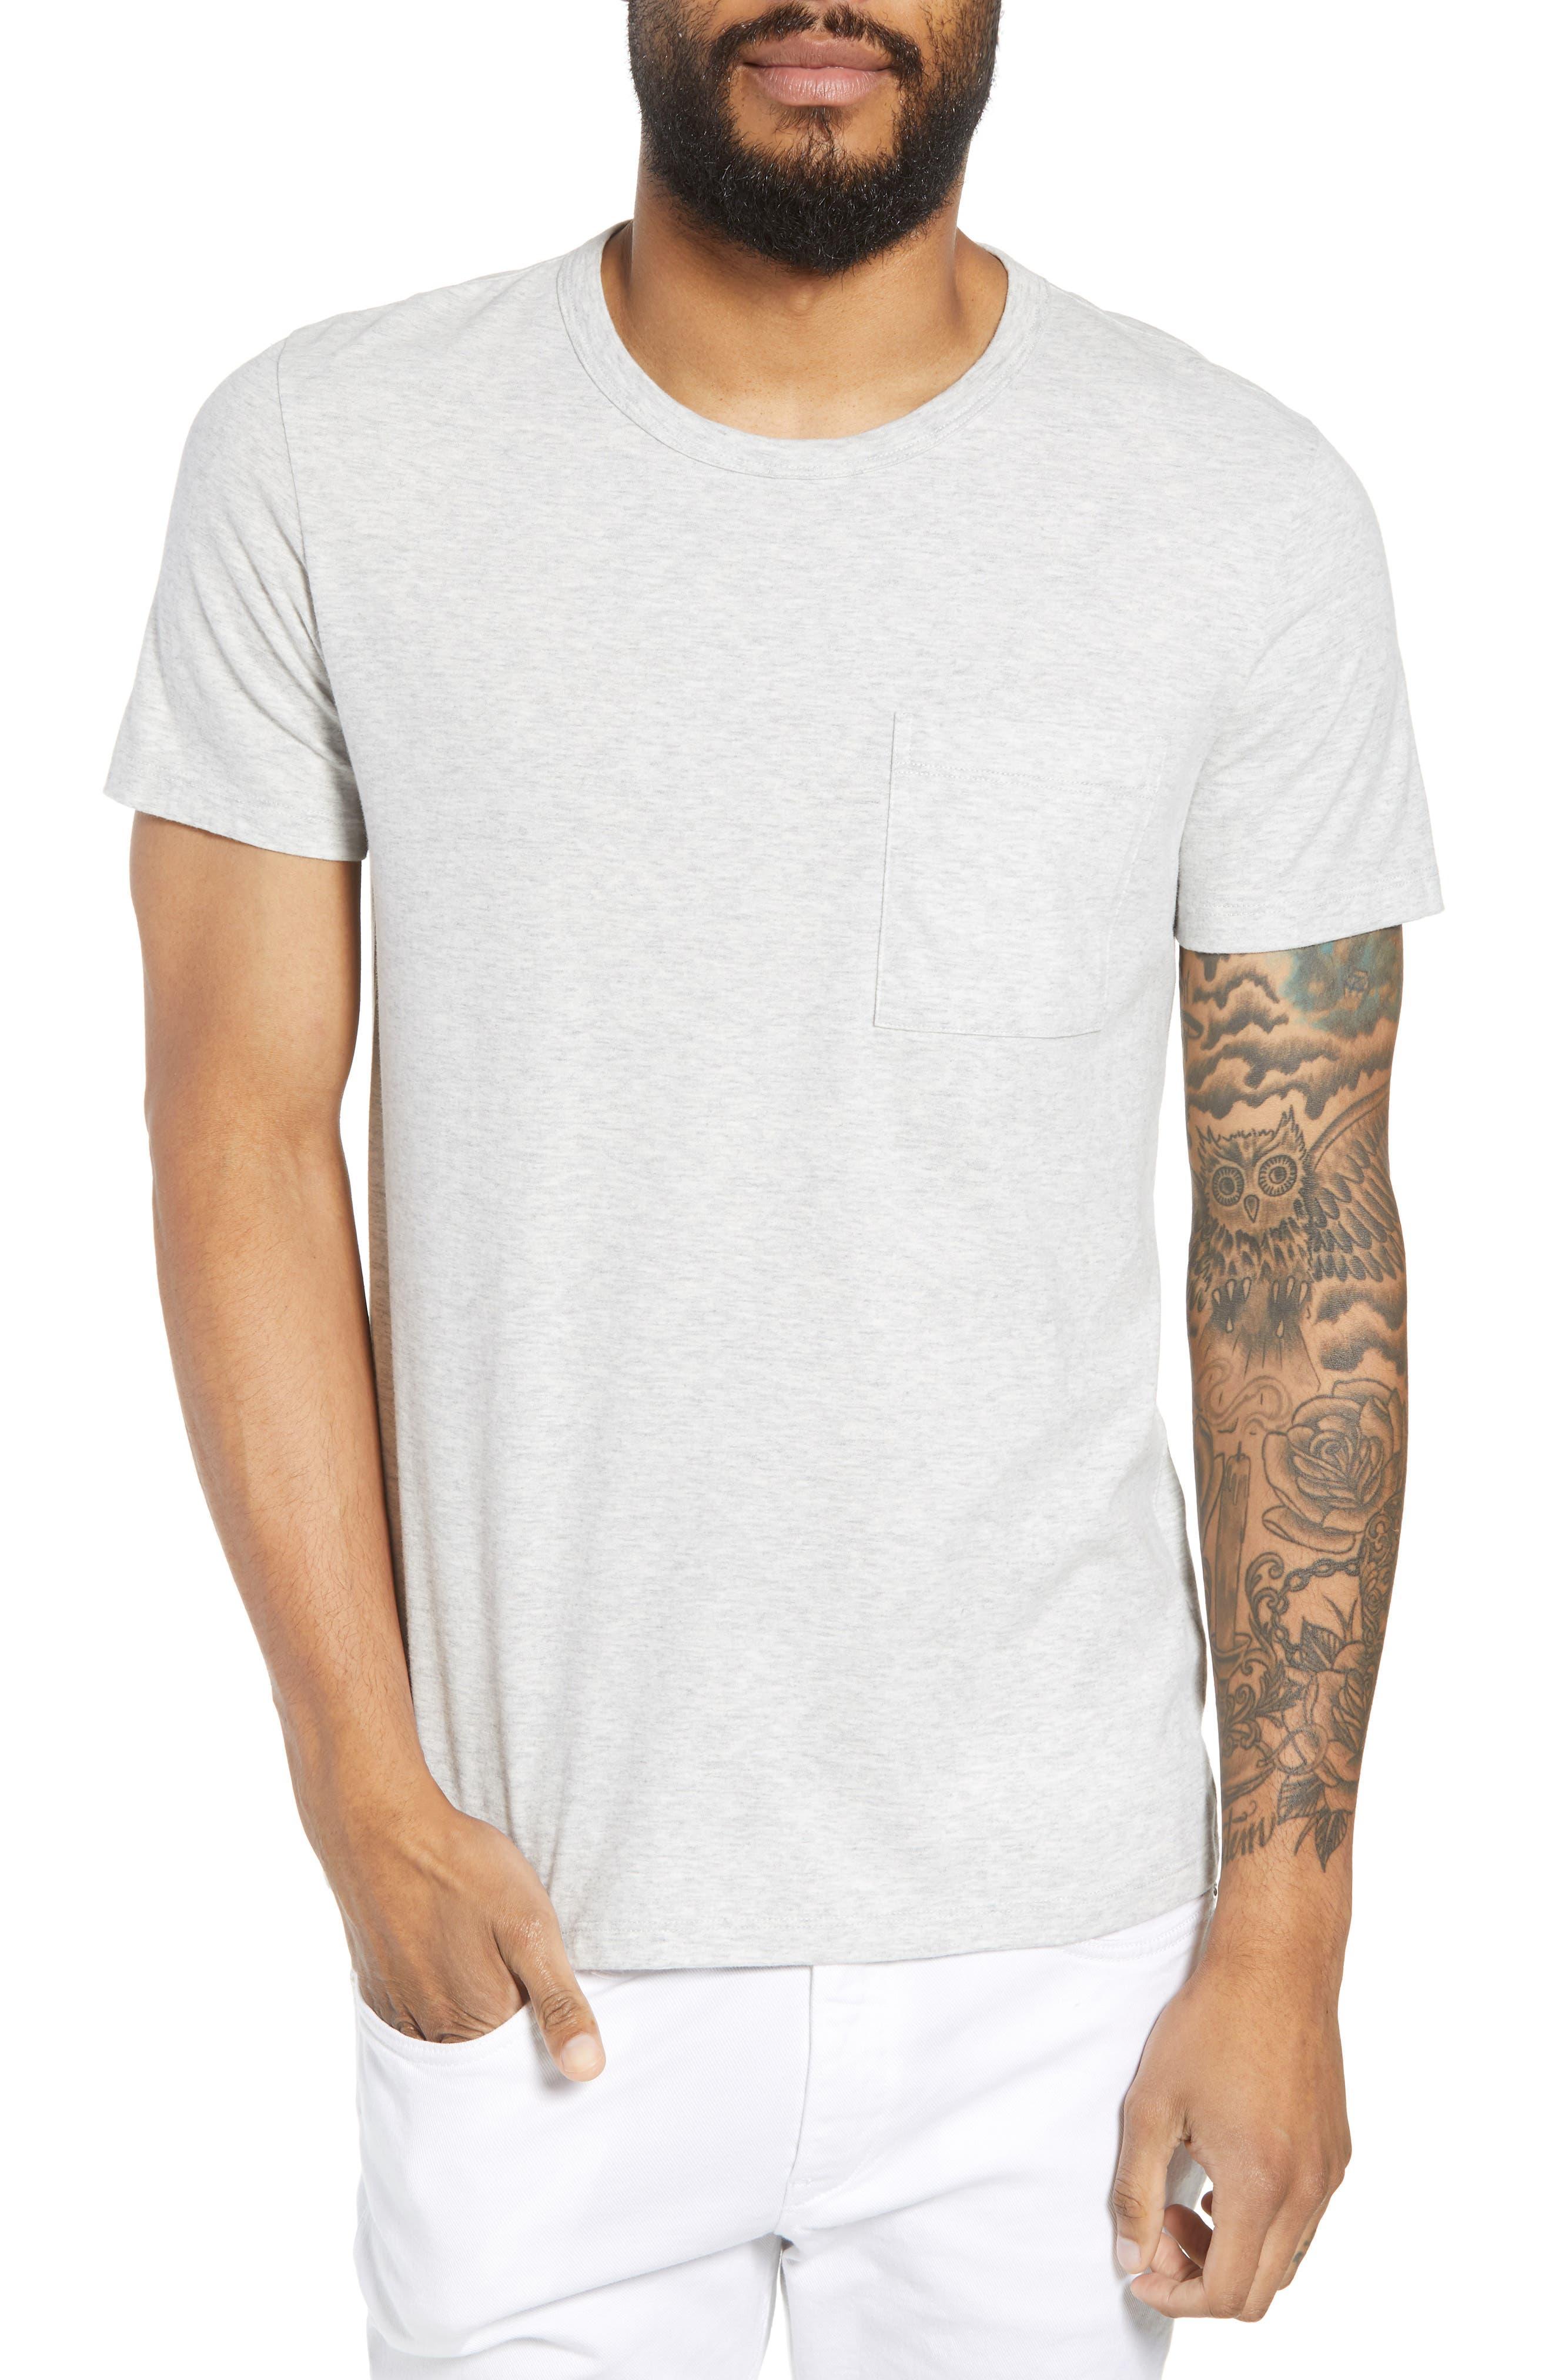 THEORY,                             Essential Pocket T-Shirt,                             Main thumbnail 1, color,                             020